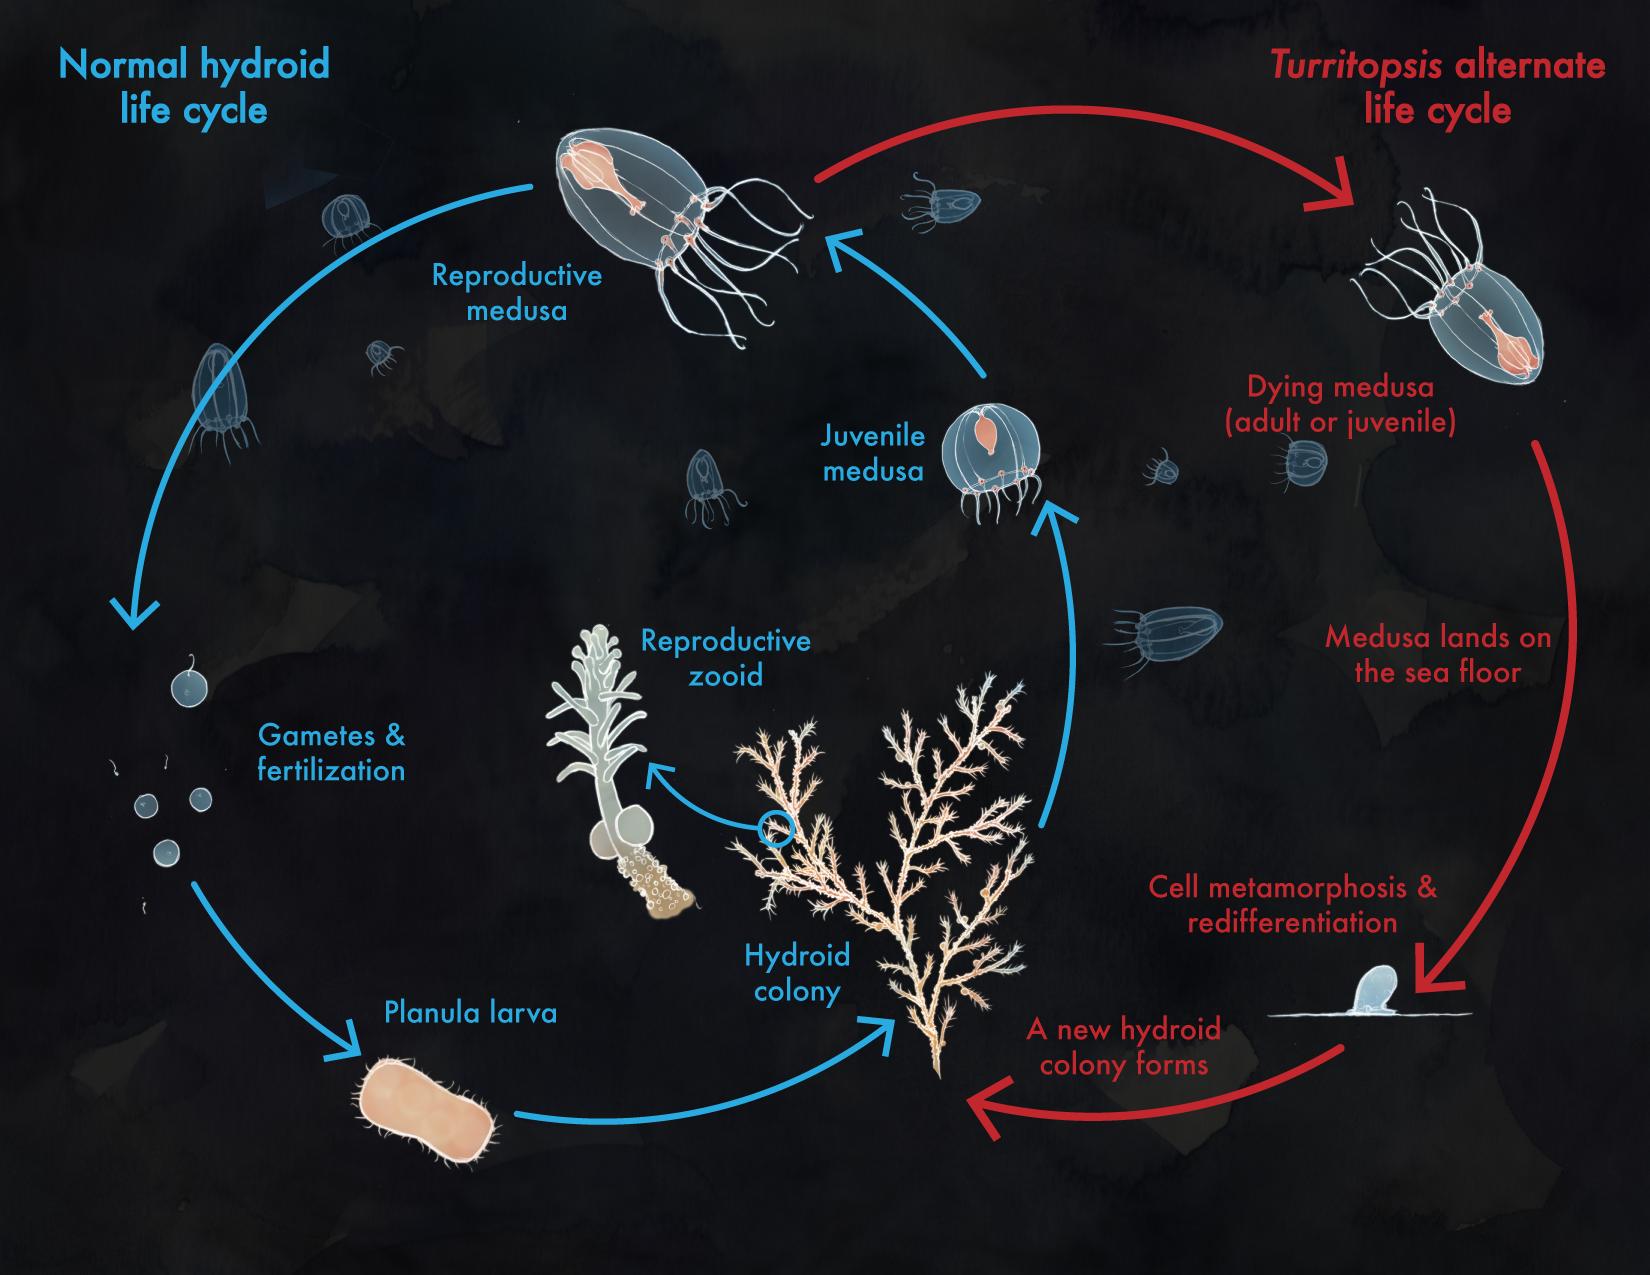 Turritopsis Life Cycle